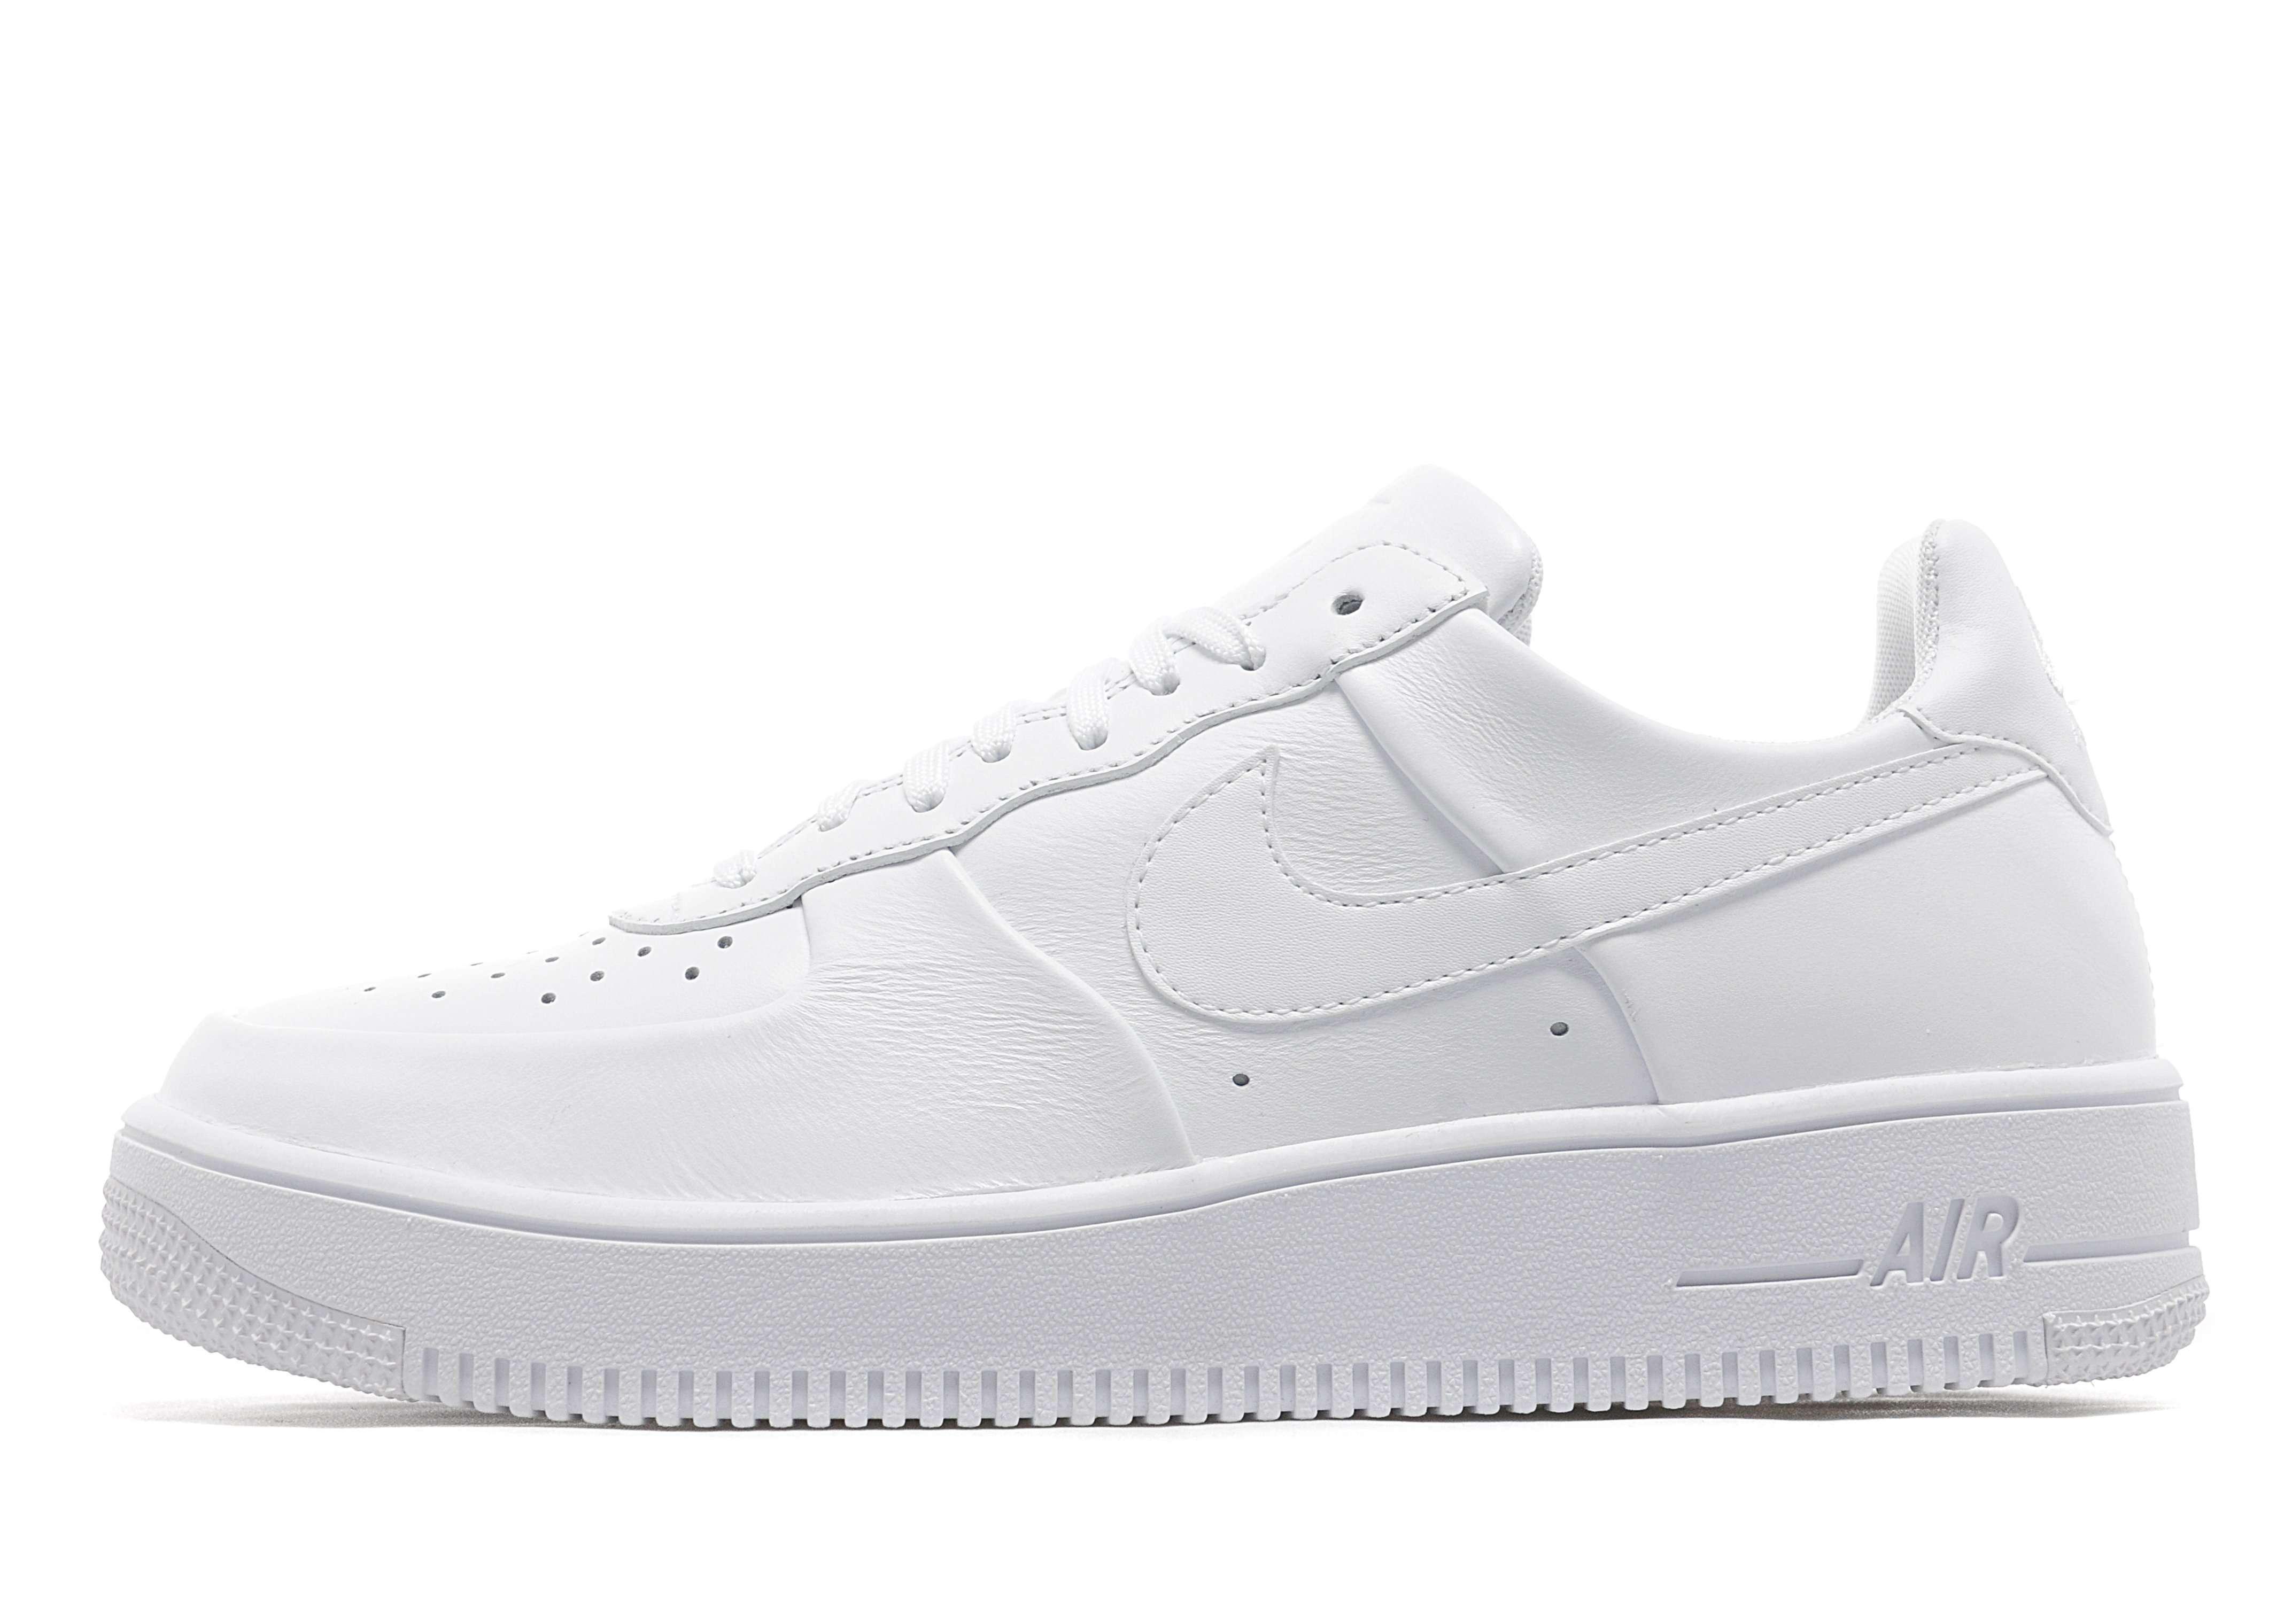 Nike Air Force 1 High Men